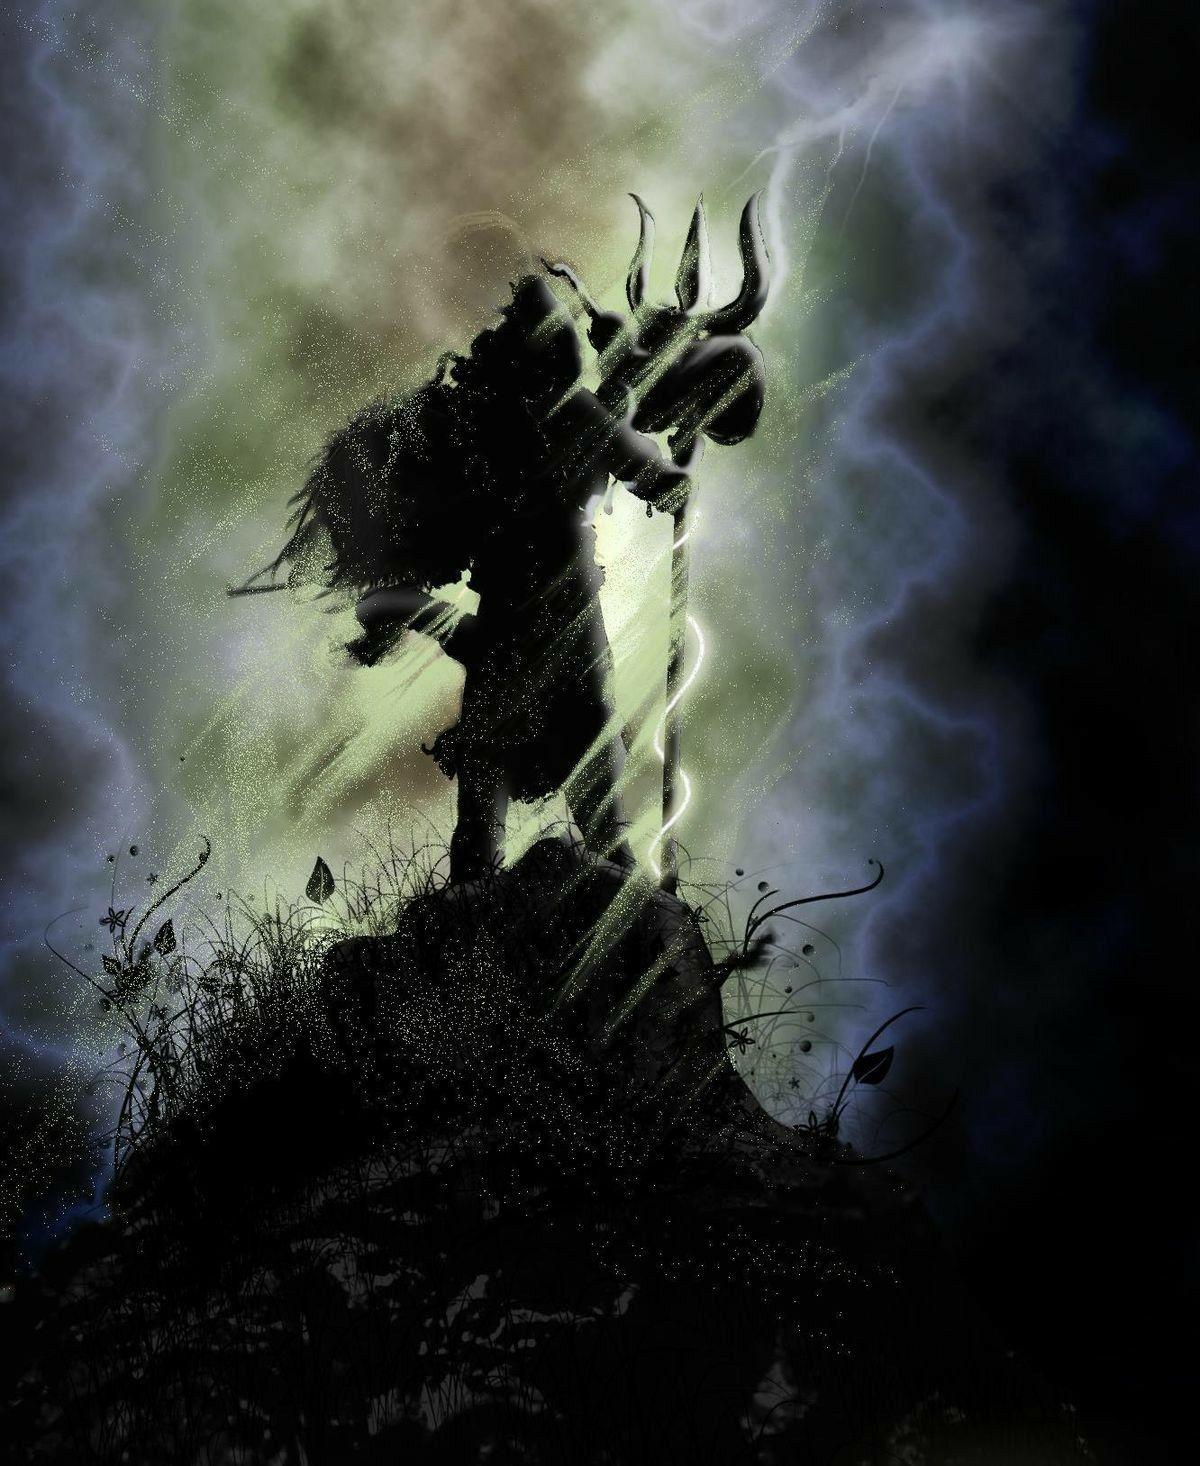 Pin By Zeynep Guler On Lord Shiva Angry Lord Shiva Lord Shiva